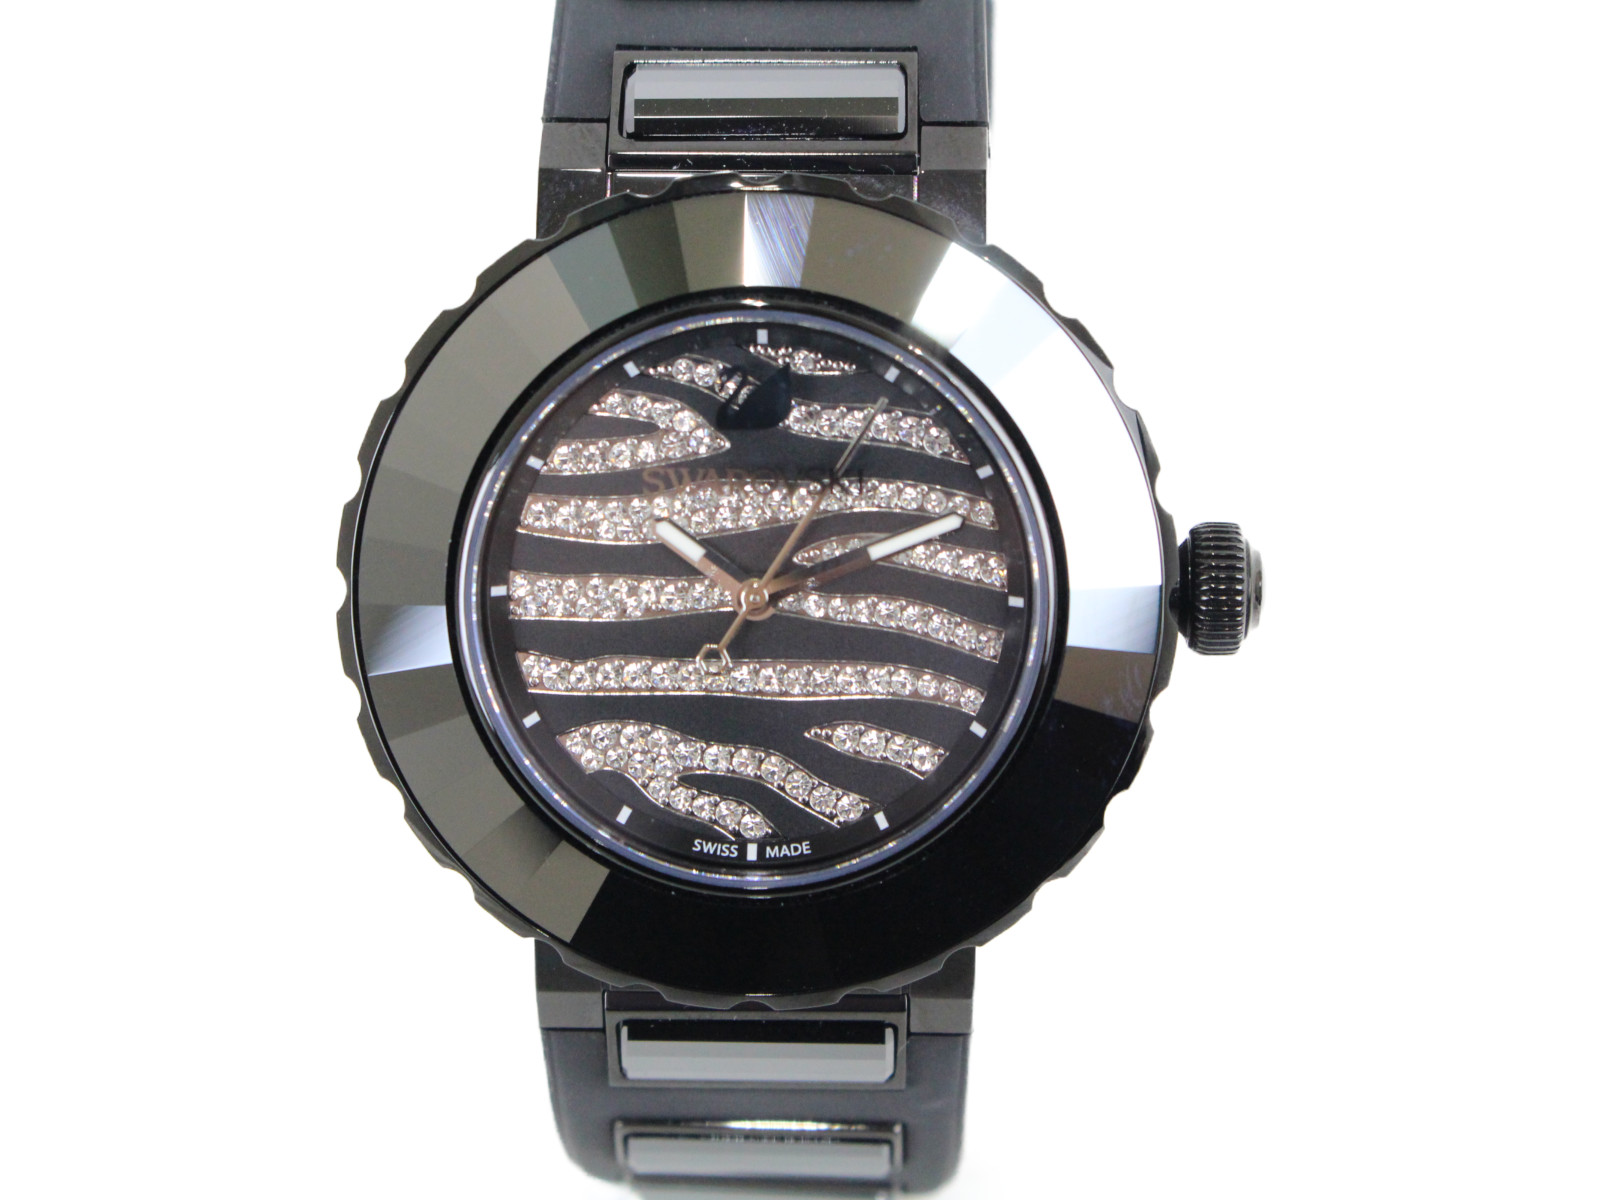 SWAROVSKI スワロフスキー New Octea Sport 5040563 ウォッチ 腕時計 ブラック ゼブラ ステンレスケース レディース 【中古】